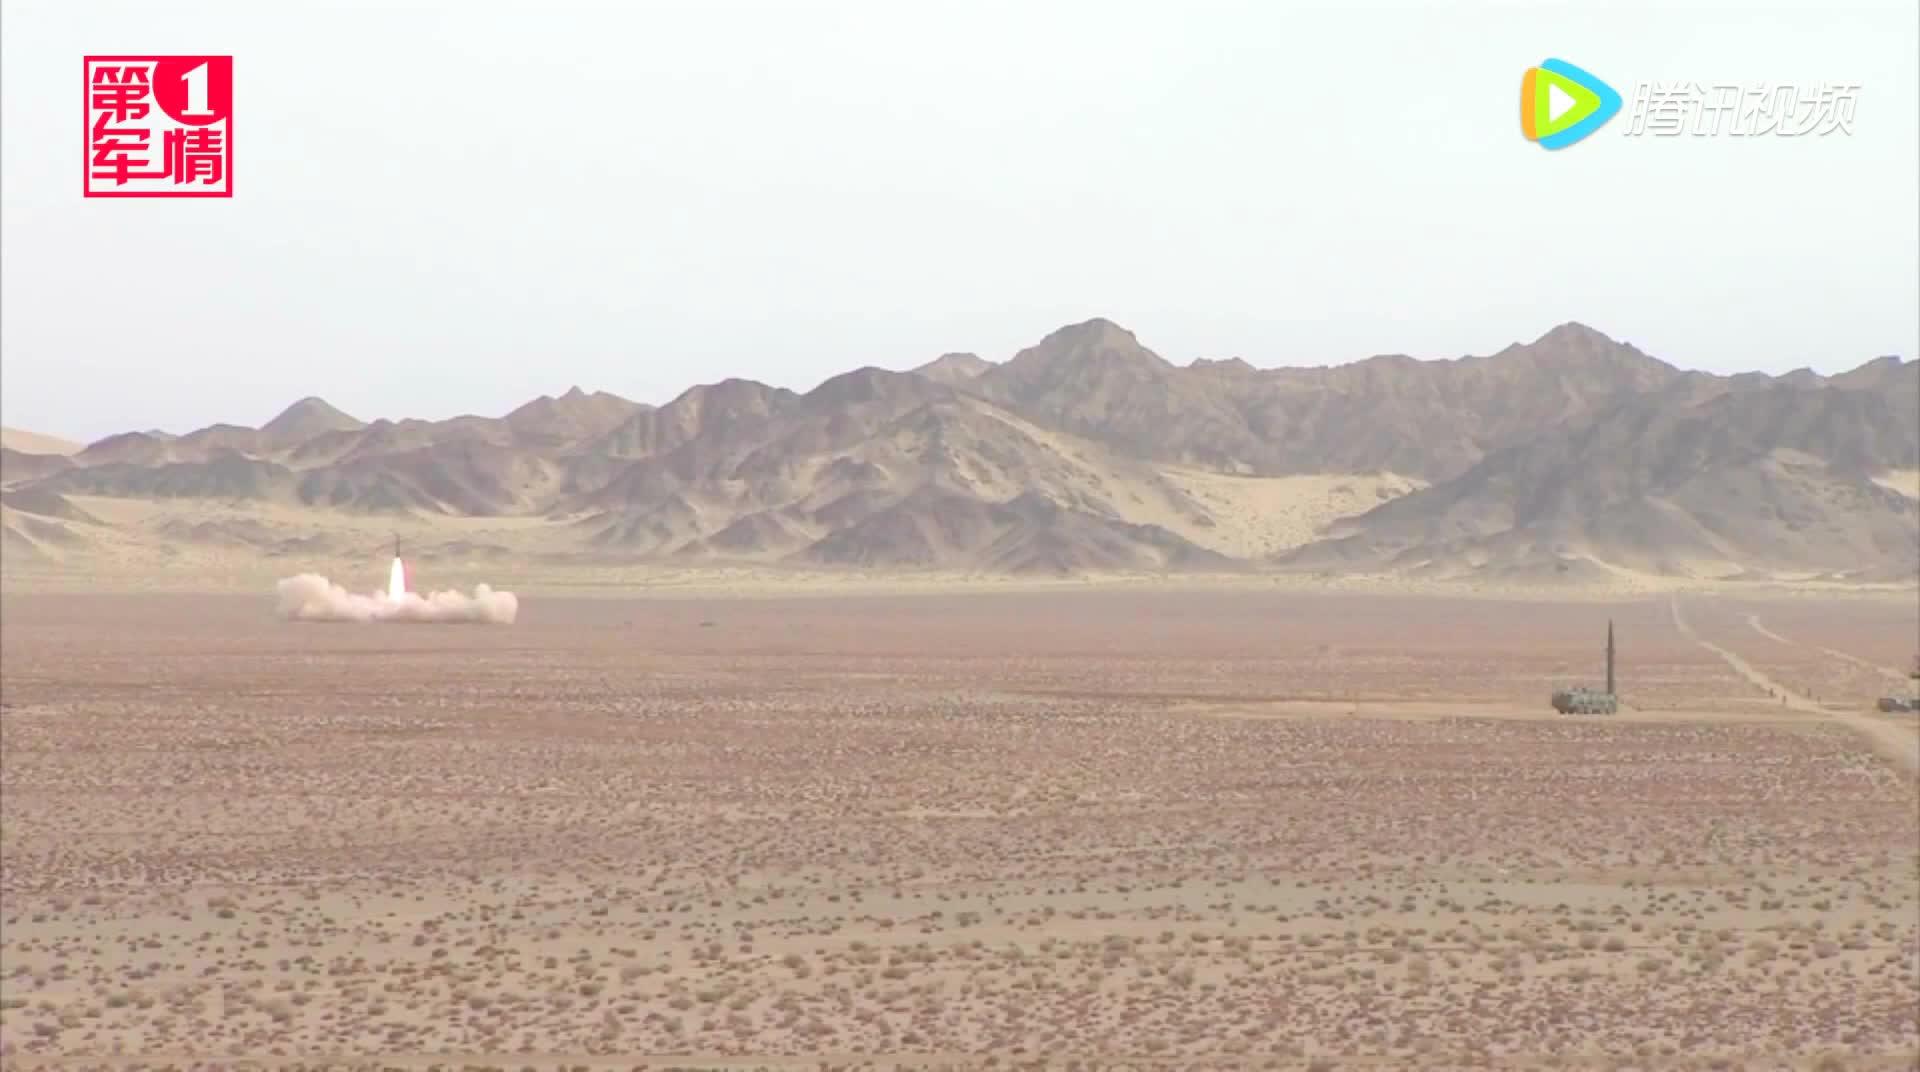 military, CCTV - China 10 DF-21C Ballistic Missiles Salvo Launch [1080p] GIFs